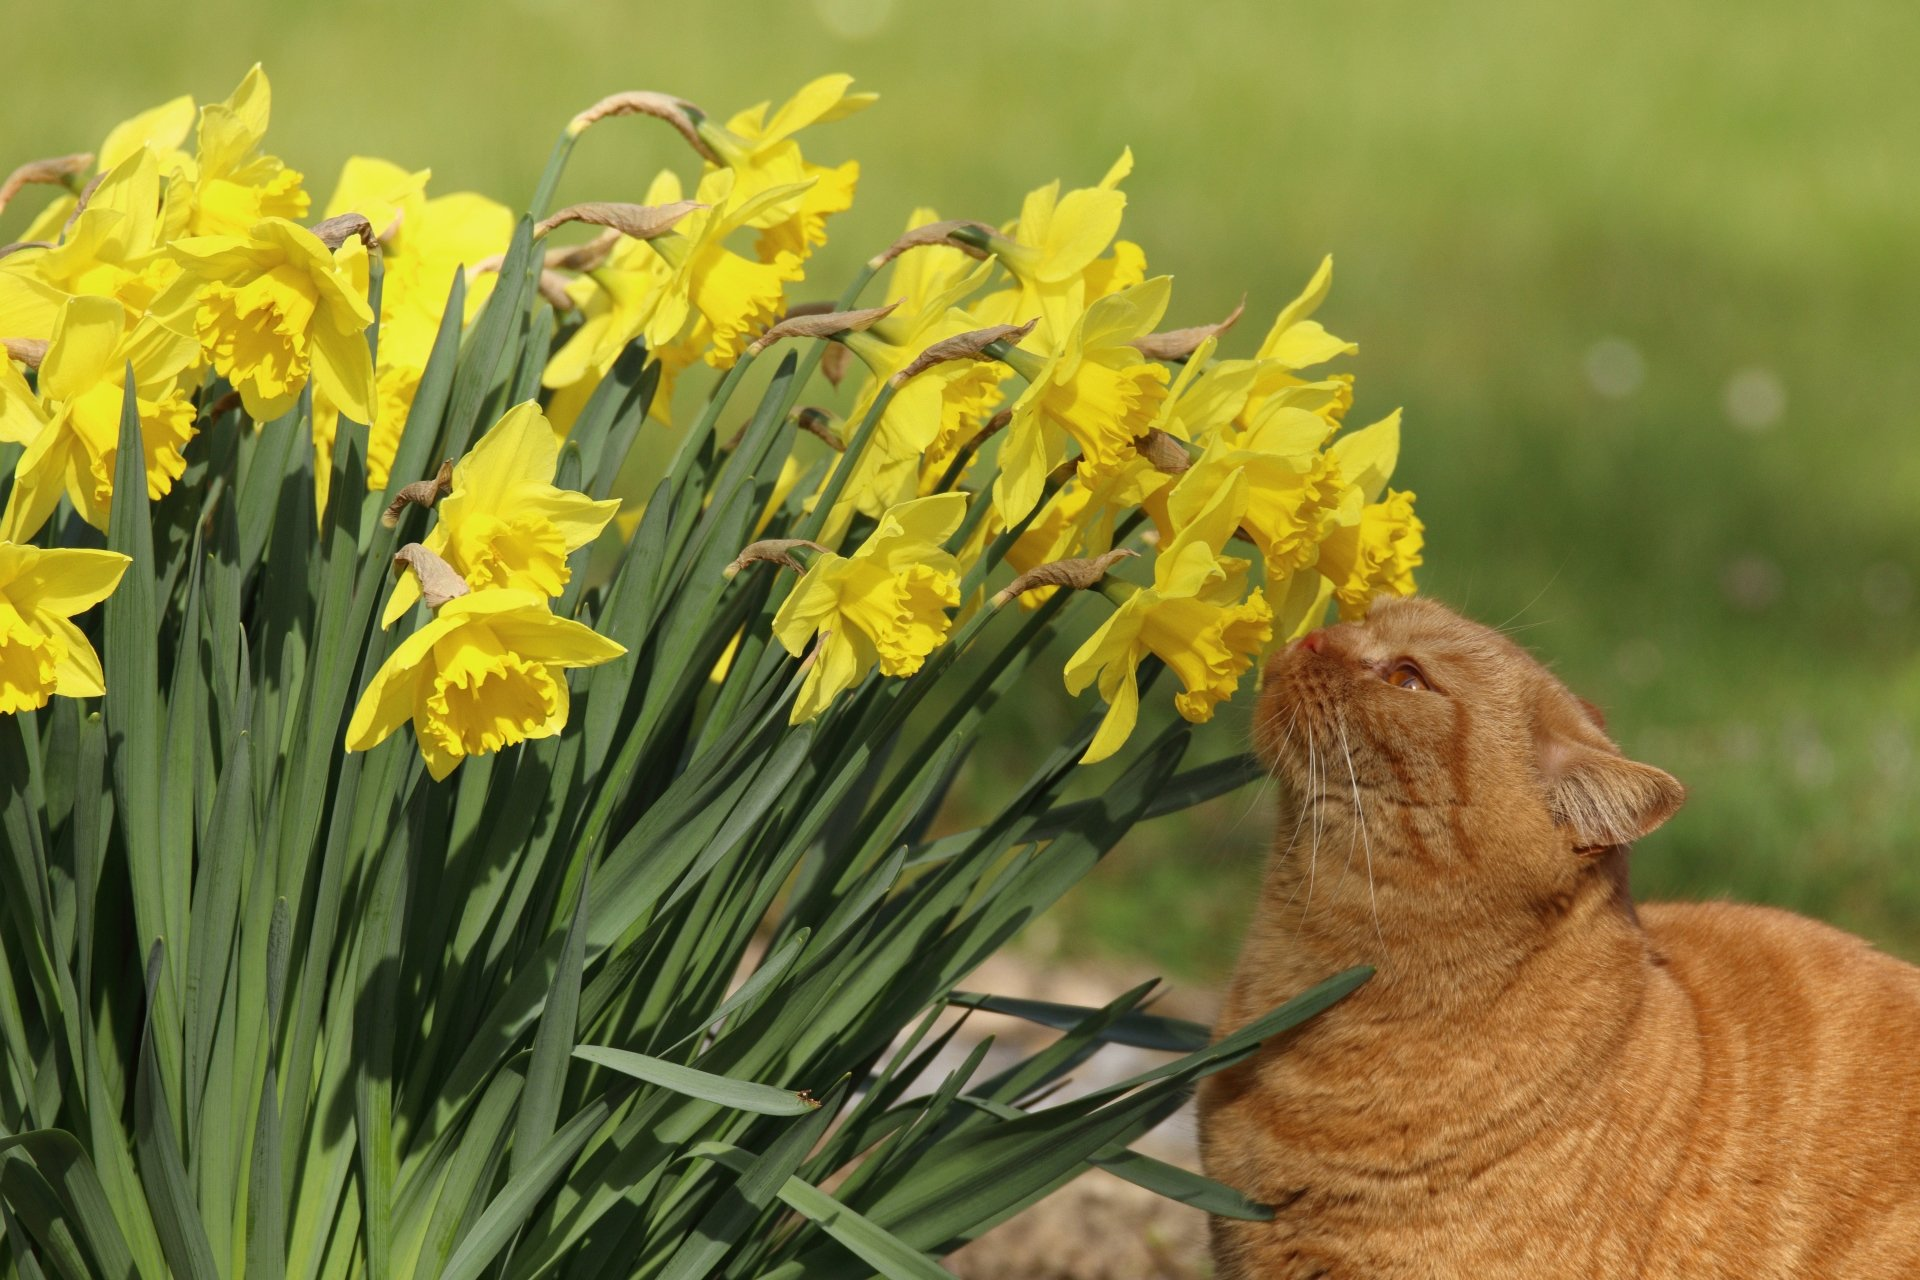 Animal - Cat  Pet Flower Summer Yellow Flower Daffodil Wallpaper